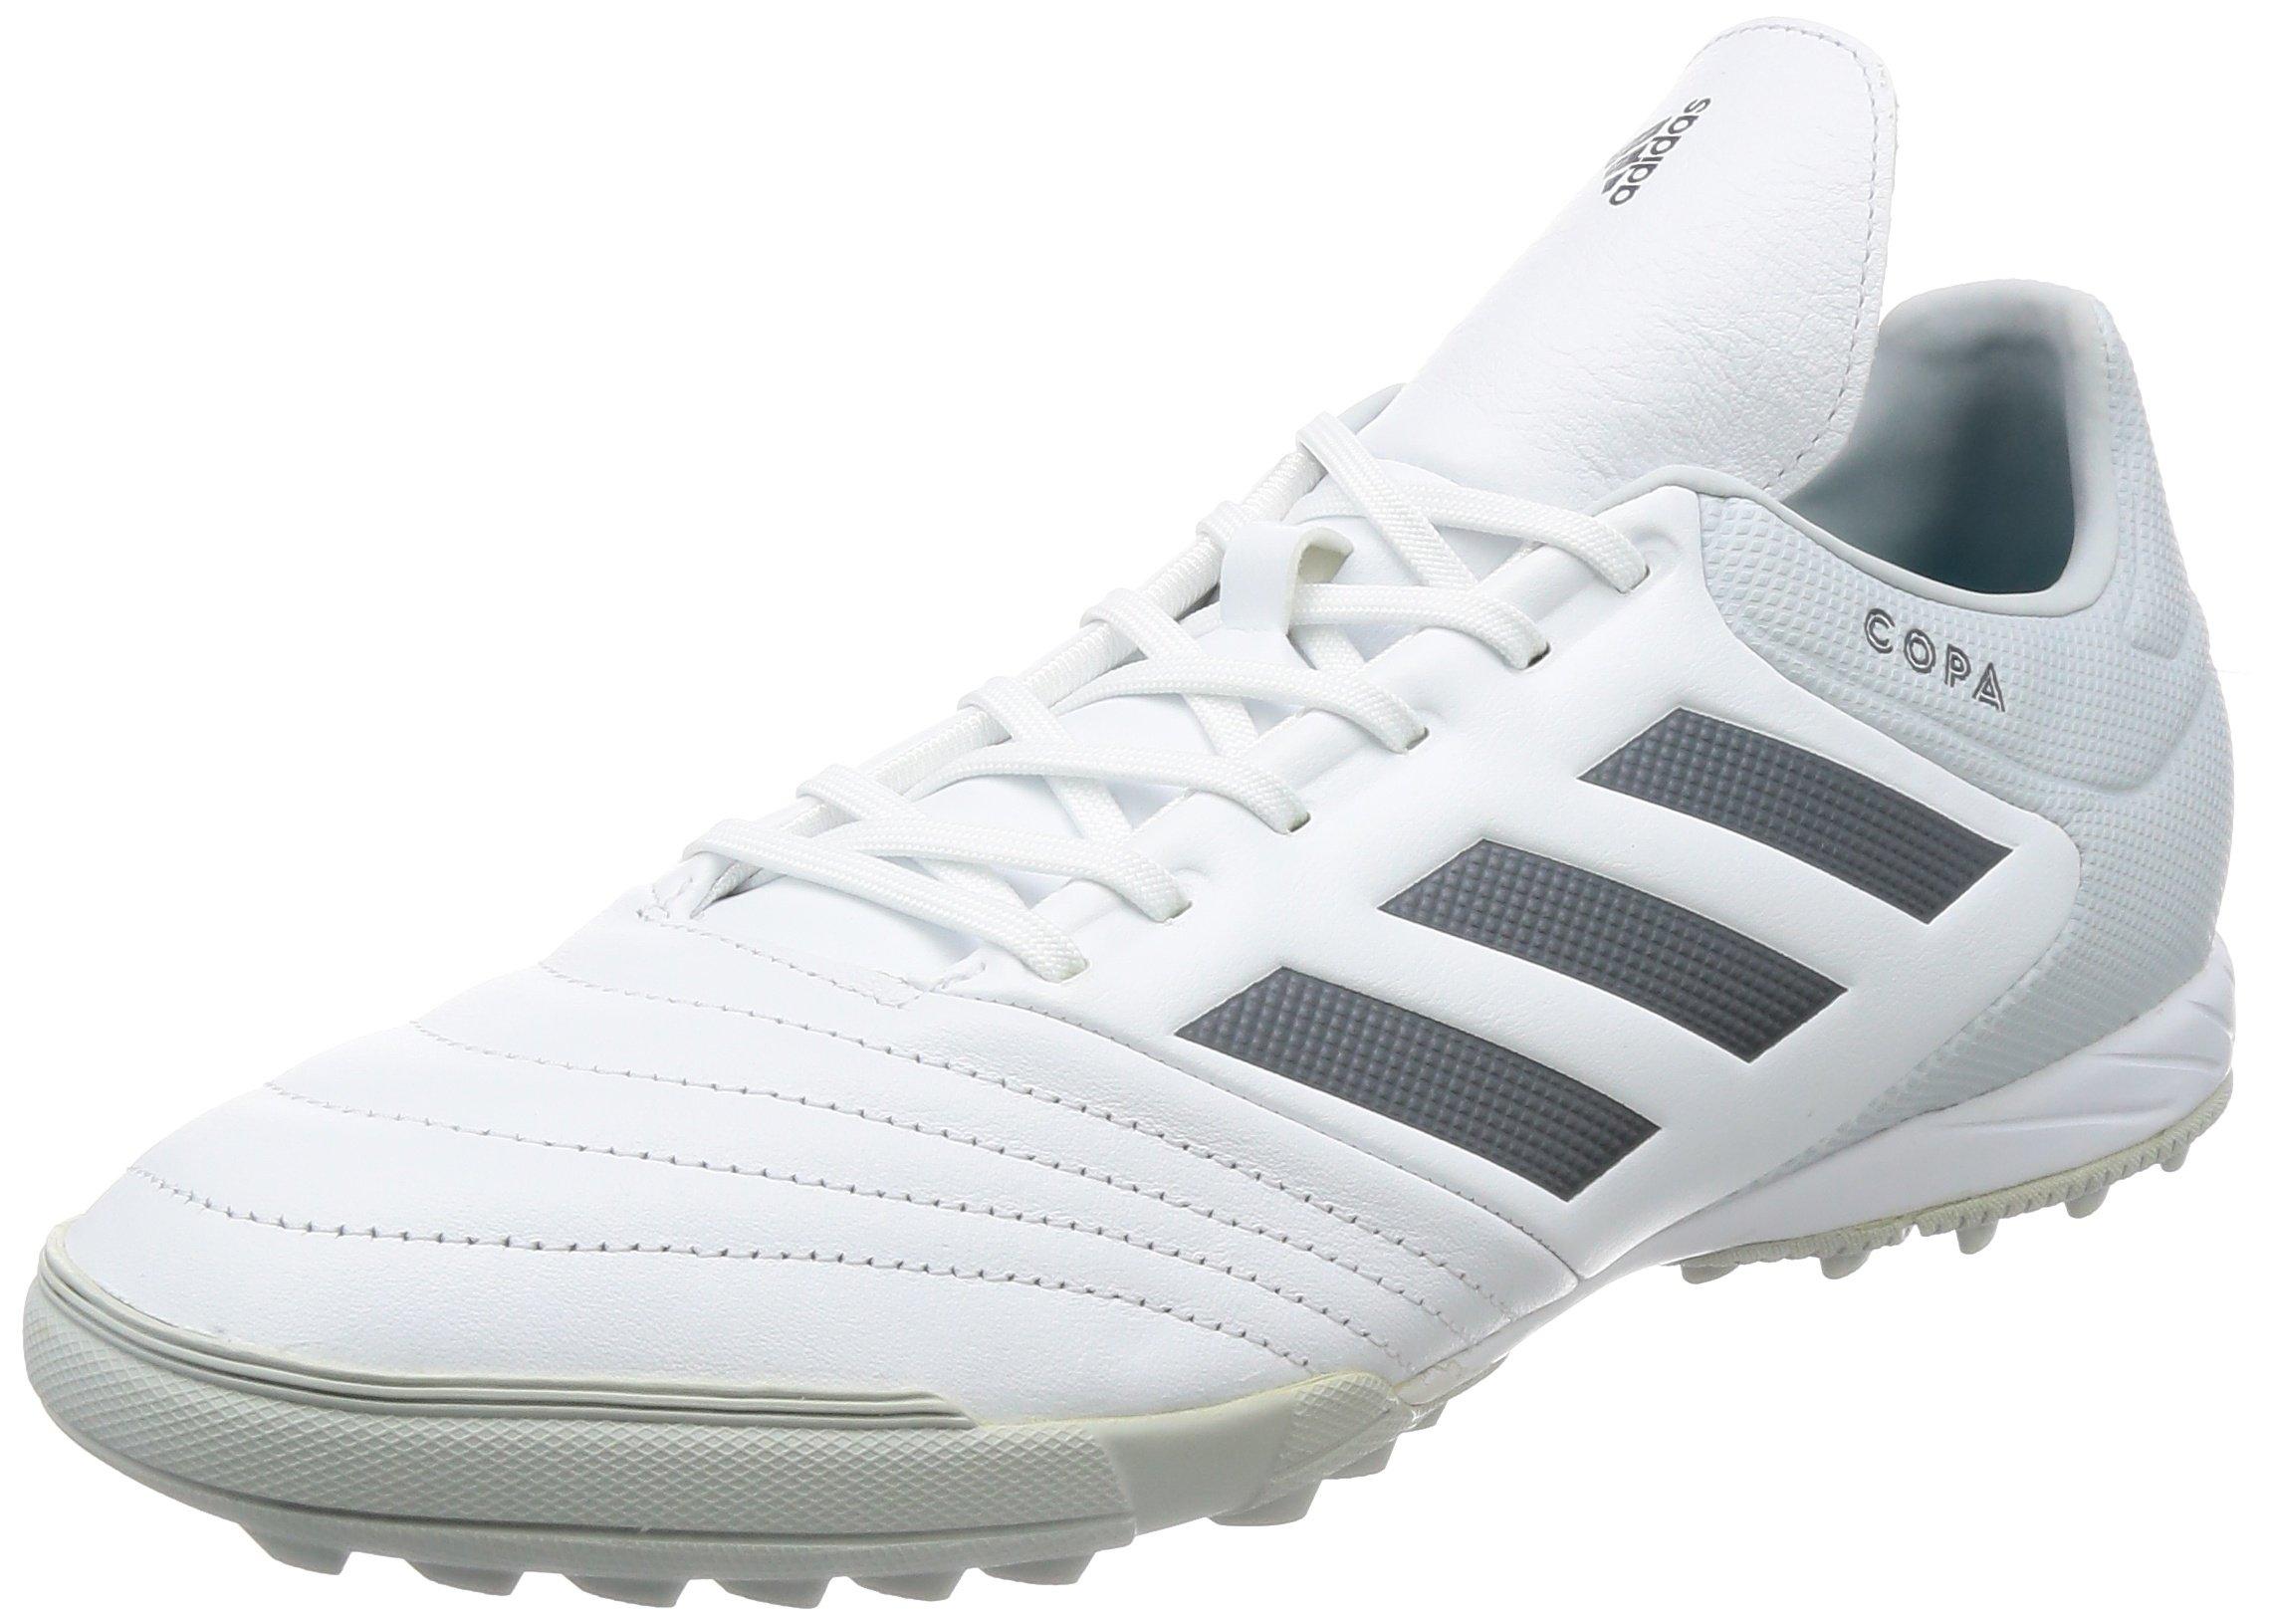 onix White clear TfChaussures Entrainement Copa De Adidas Football HommeBlancfootwear Grey46 Eu 17 3 Tango sQdCrht